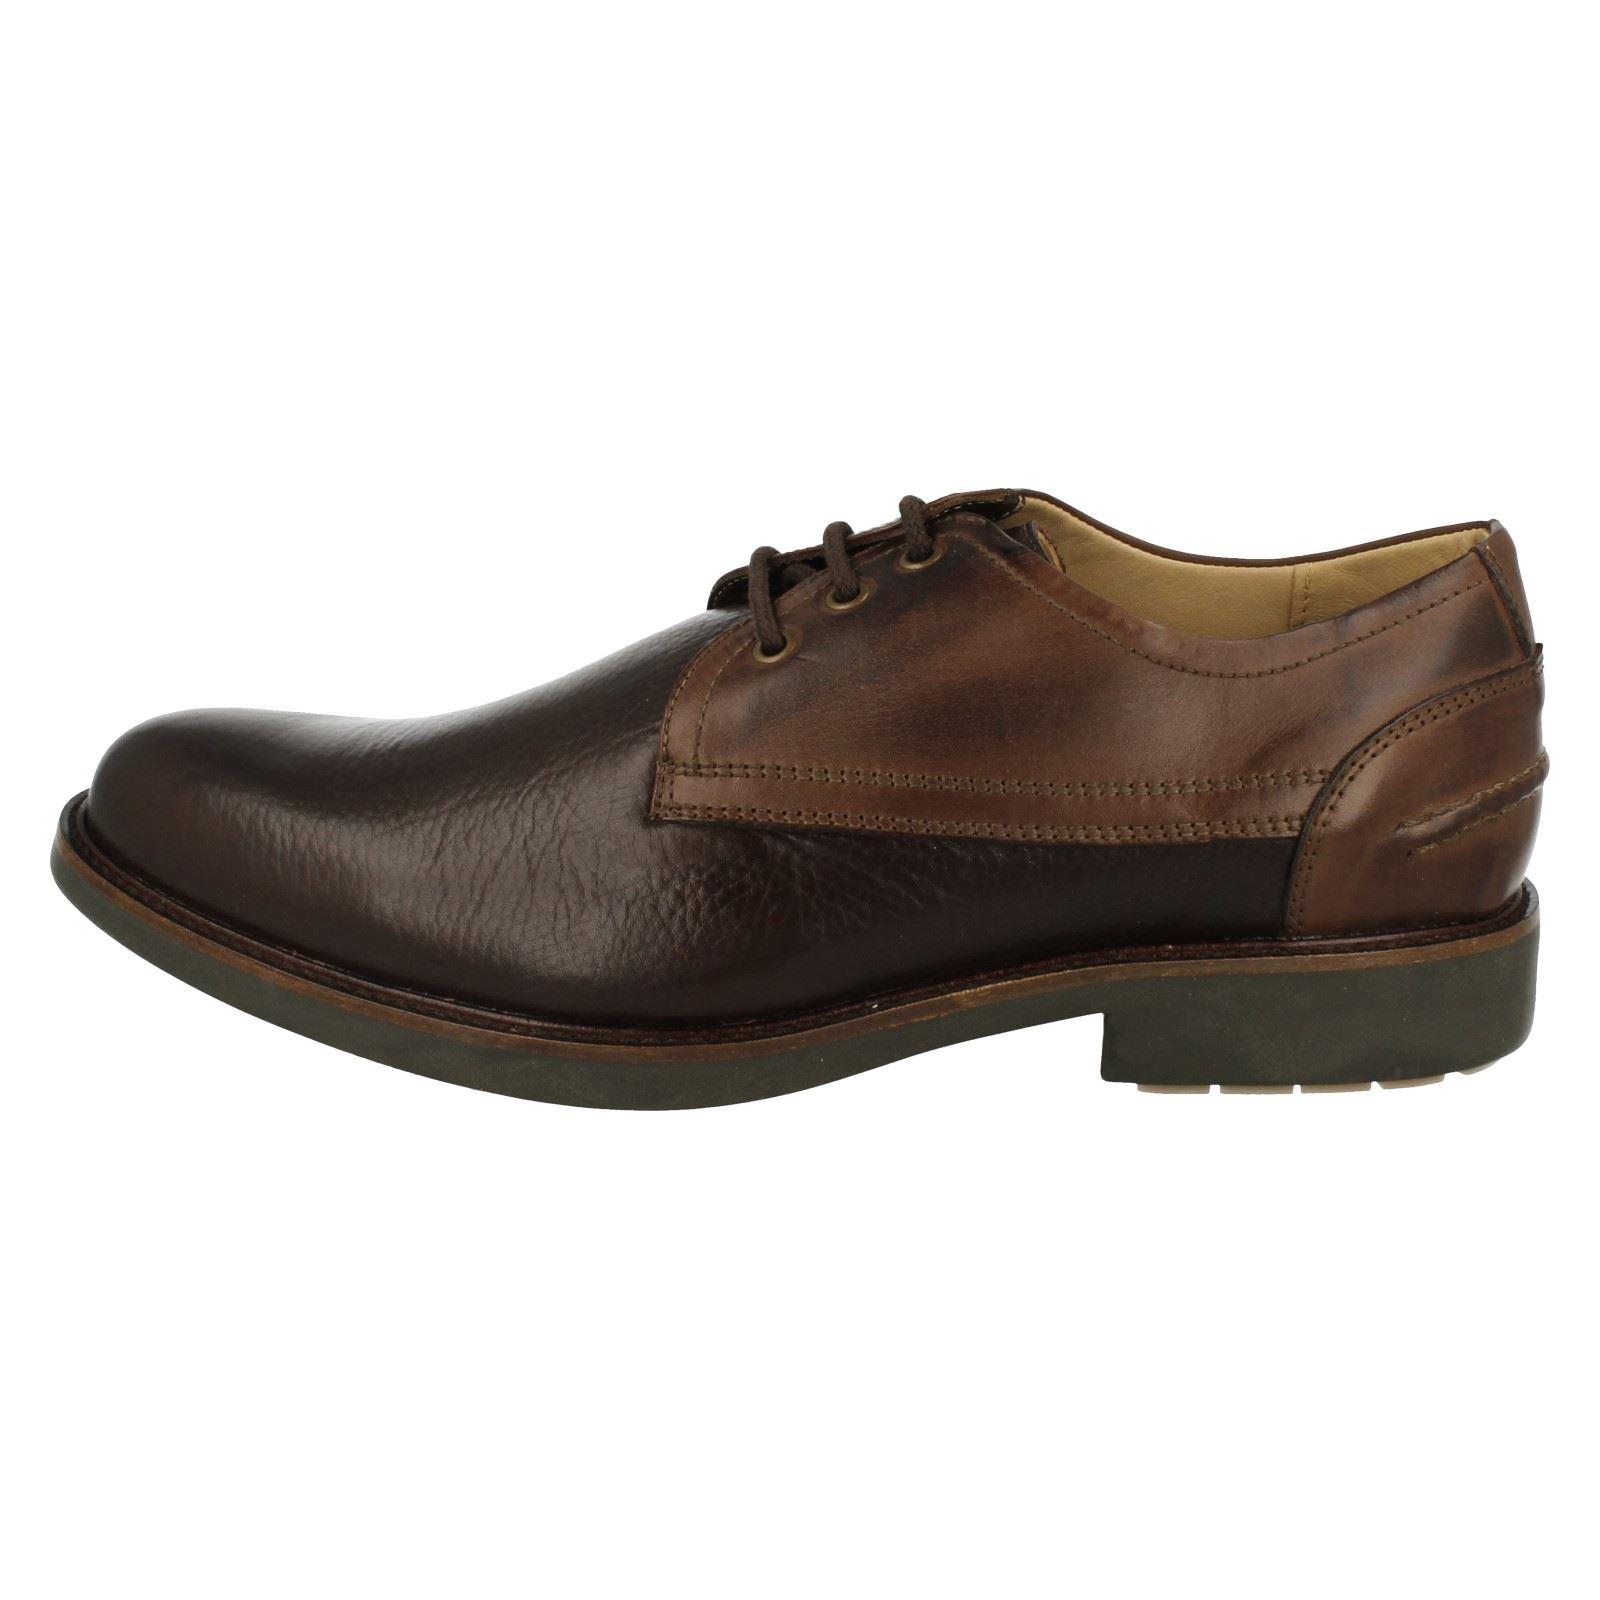 Chaussures Chaussures Chaussures Chaussures Chaussures Chaussures 5ZqxUvxw